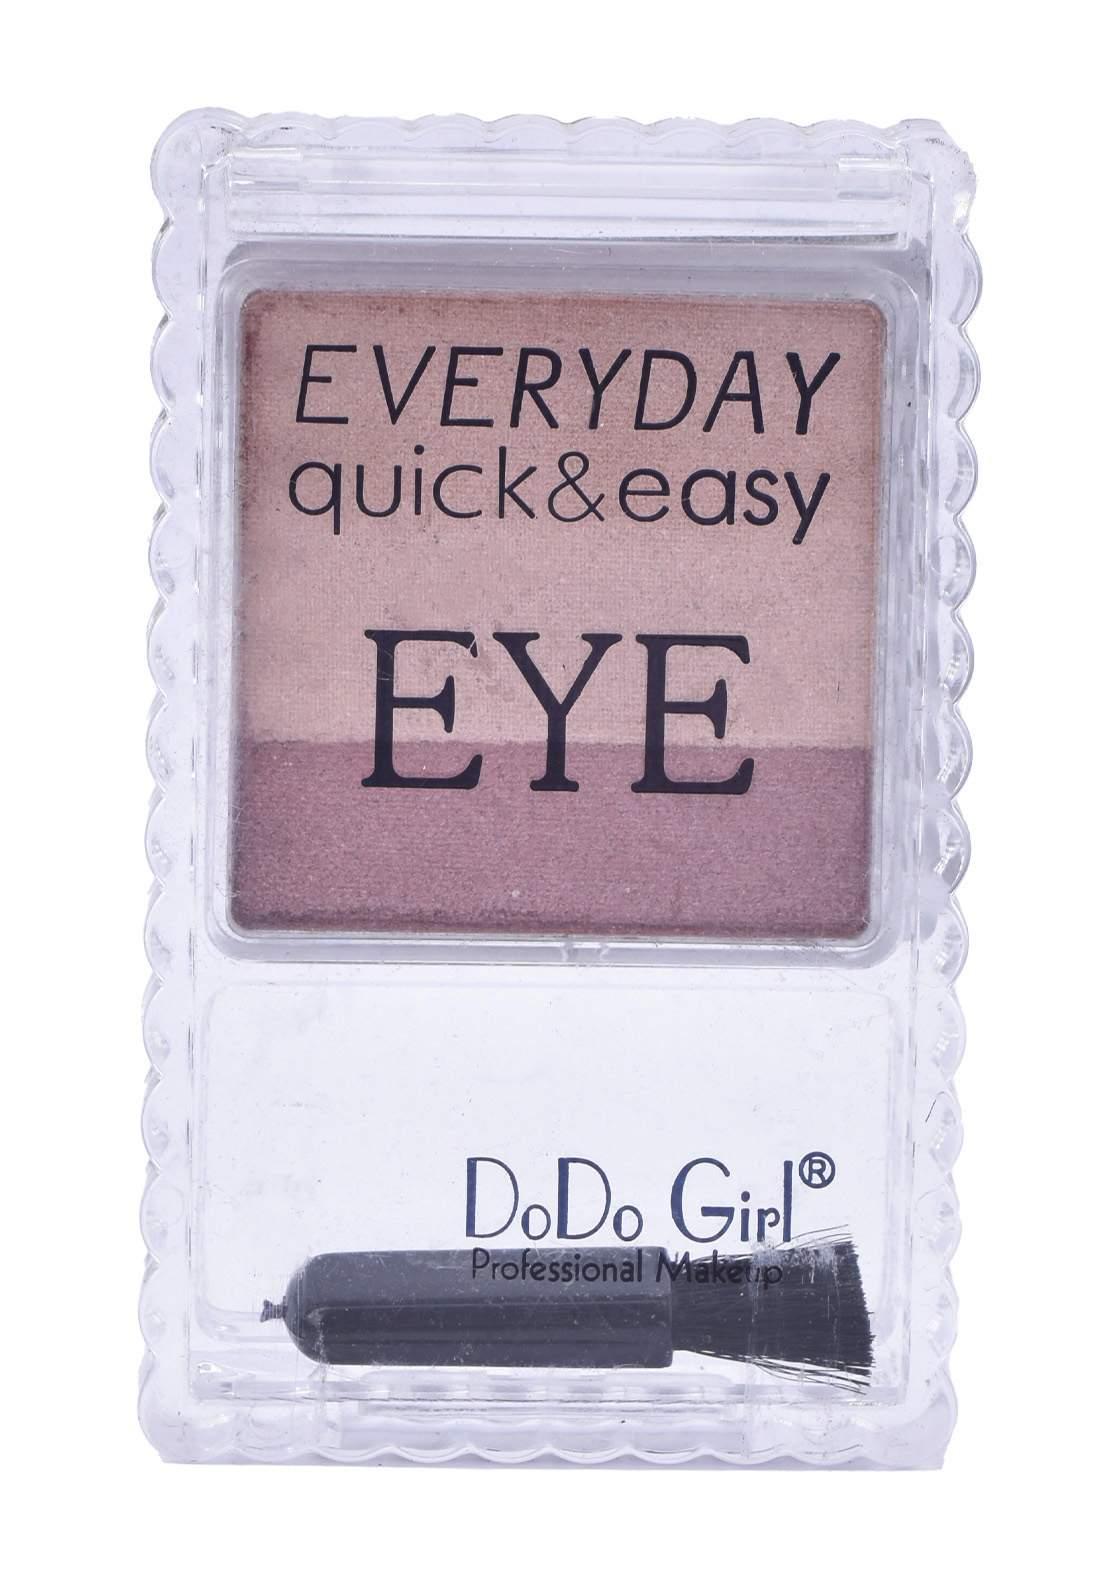 Dodo Girl Every Day Quick & Easy Eye Shadow No.3 ظلال للعين